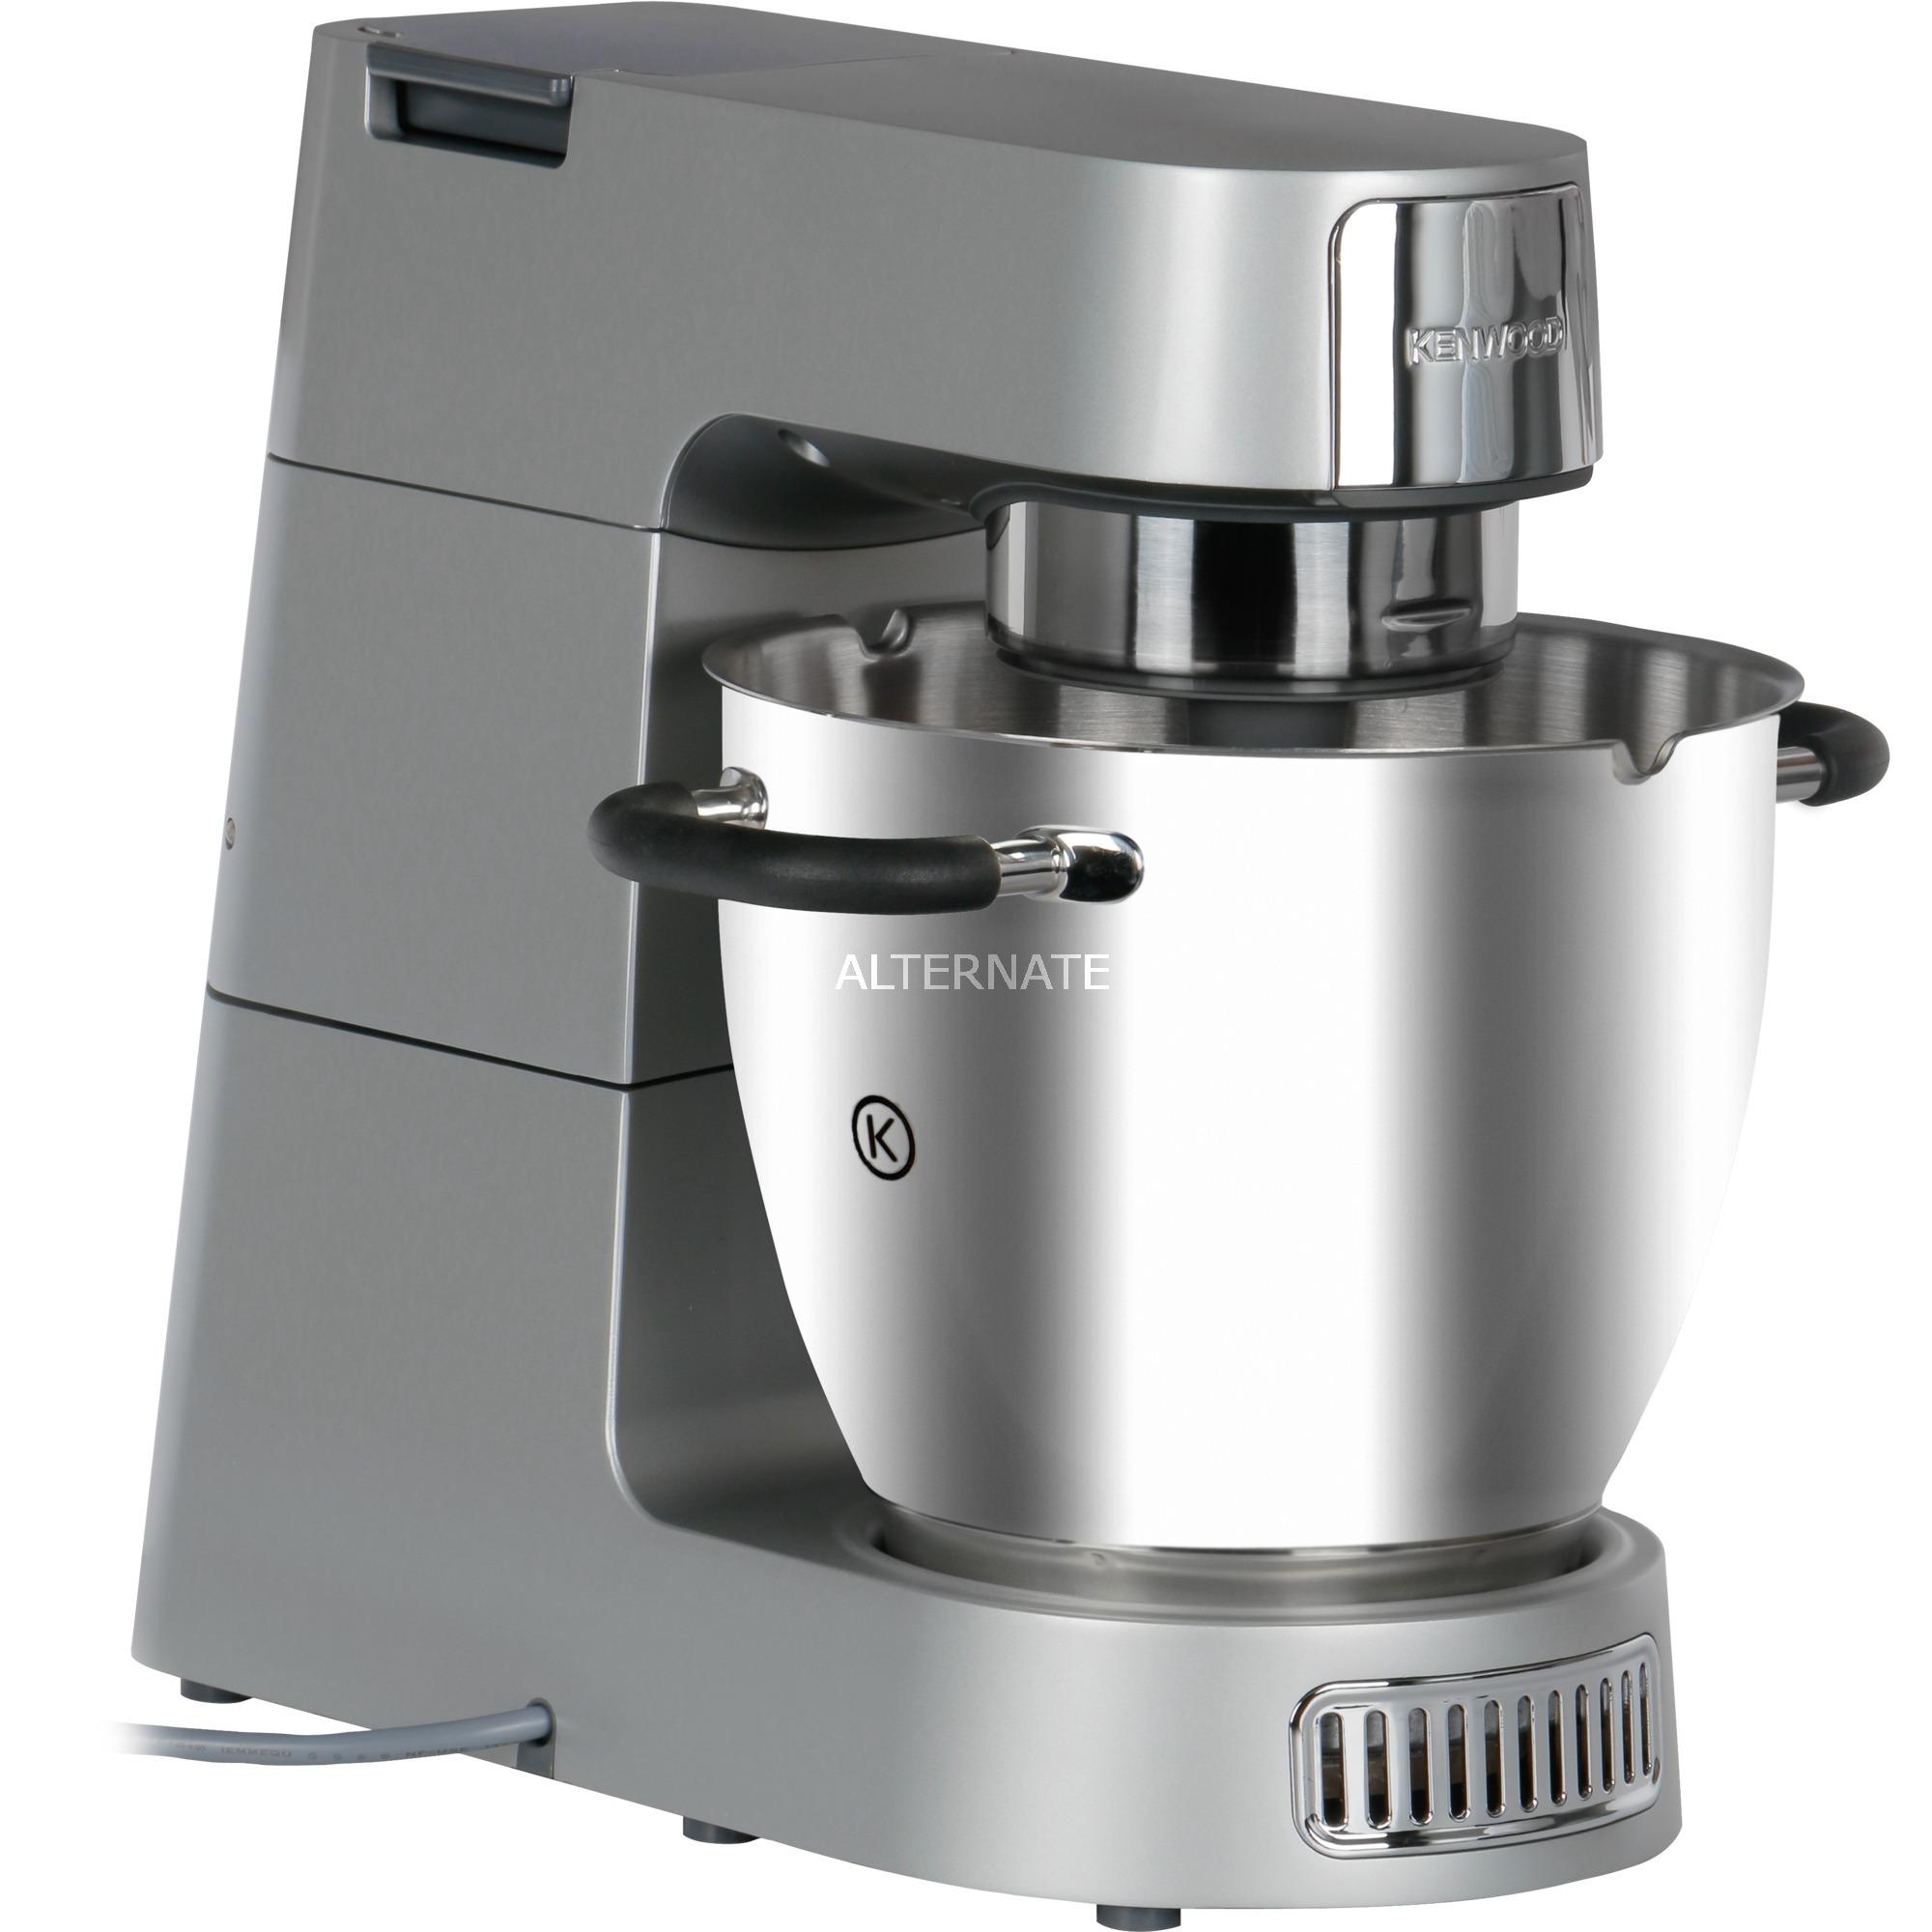 Cooking Chef Gourmet KCC9060S 1500W 6.7L Argento, Robot da cucina (argento,  6,7 L, 180 °C, CE, Argento, Pulsanti, Manopola, Touch, Acciaio ...